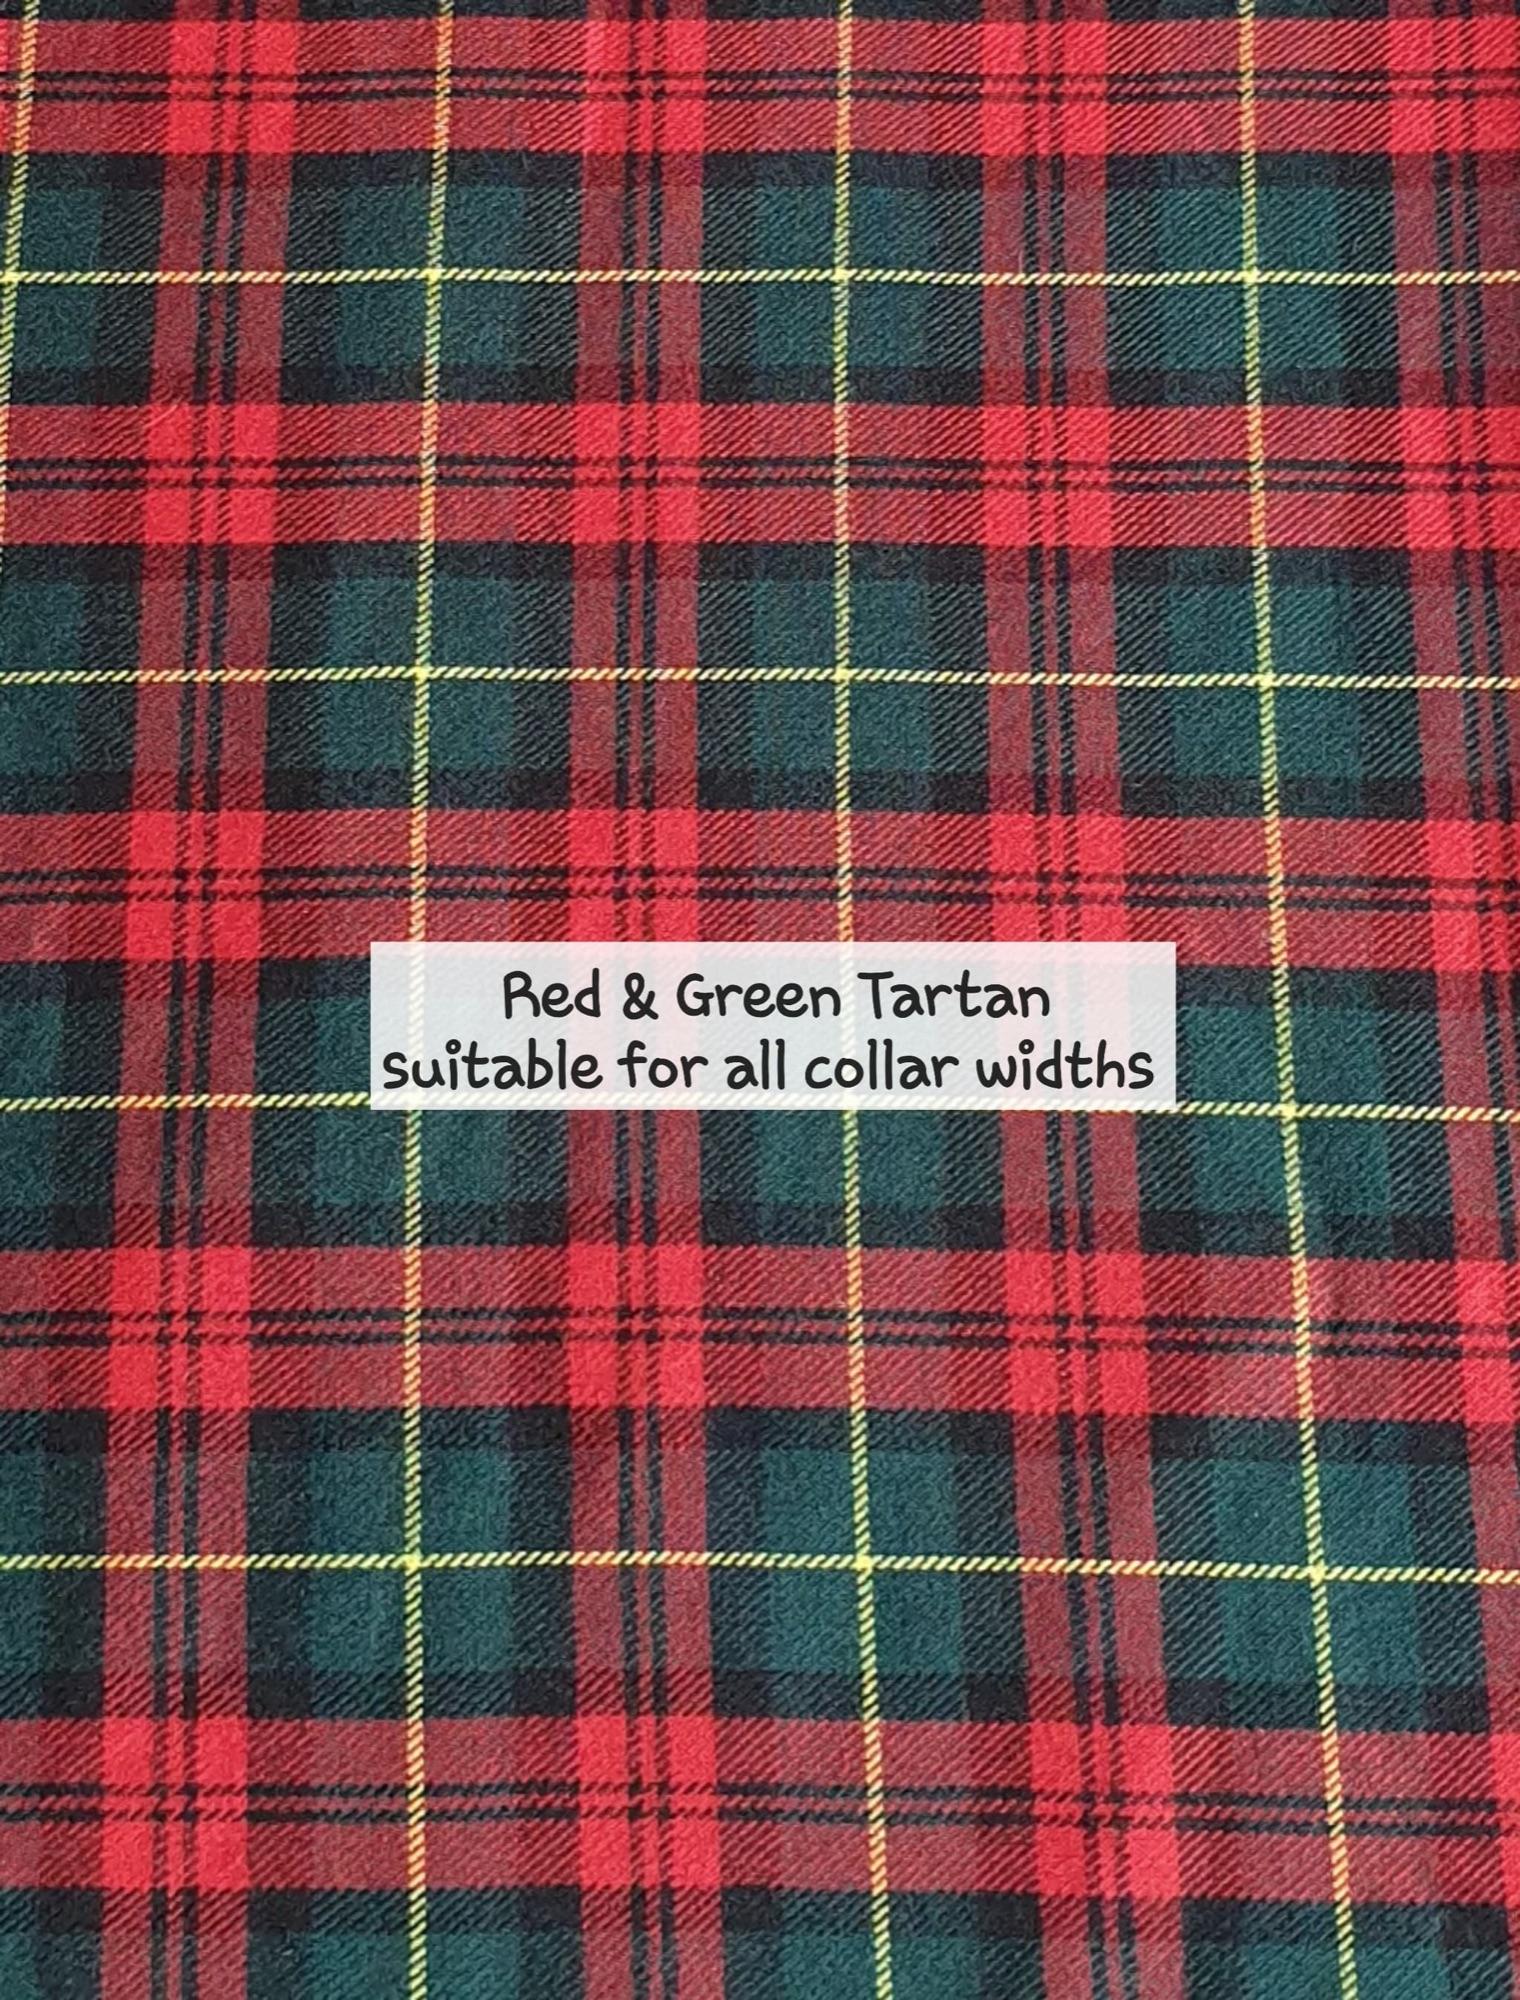 Red & Green Tartan